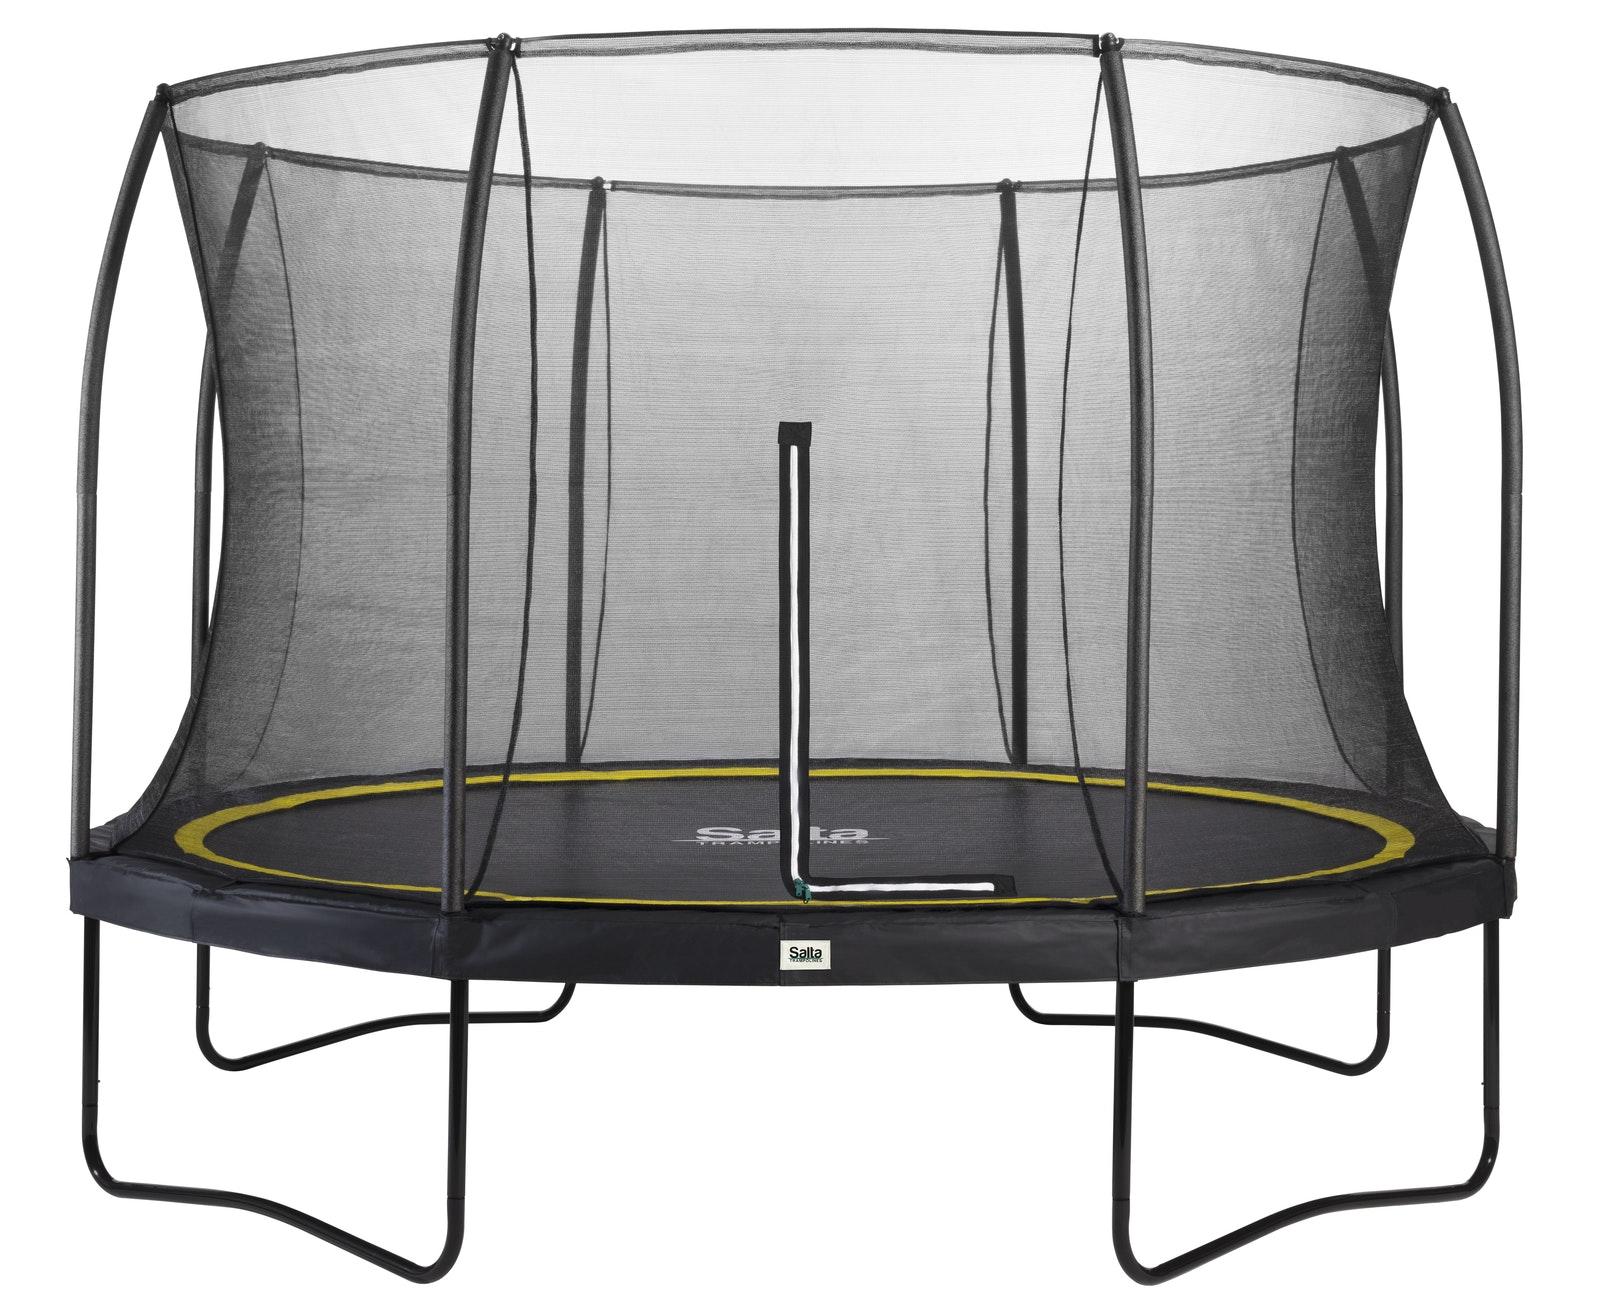 trampolin-profi.de/Salta-Trampolin-Comfort-Edition-R-305-cm-schwarz-mit-Netz